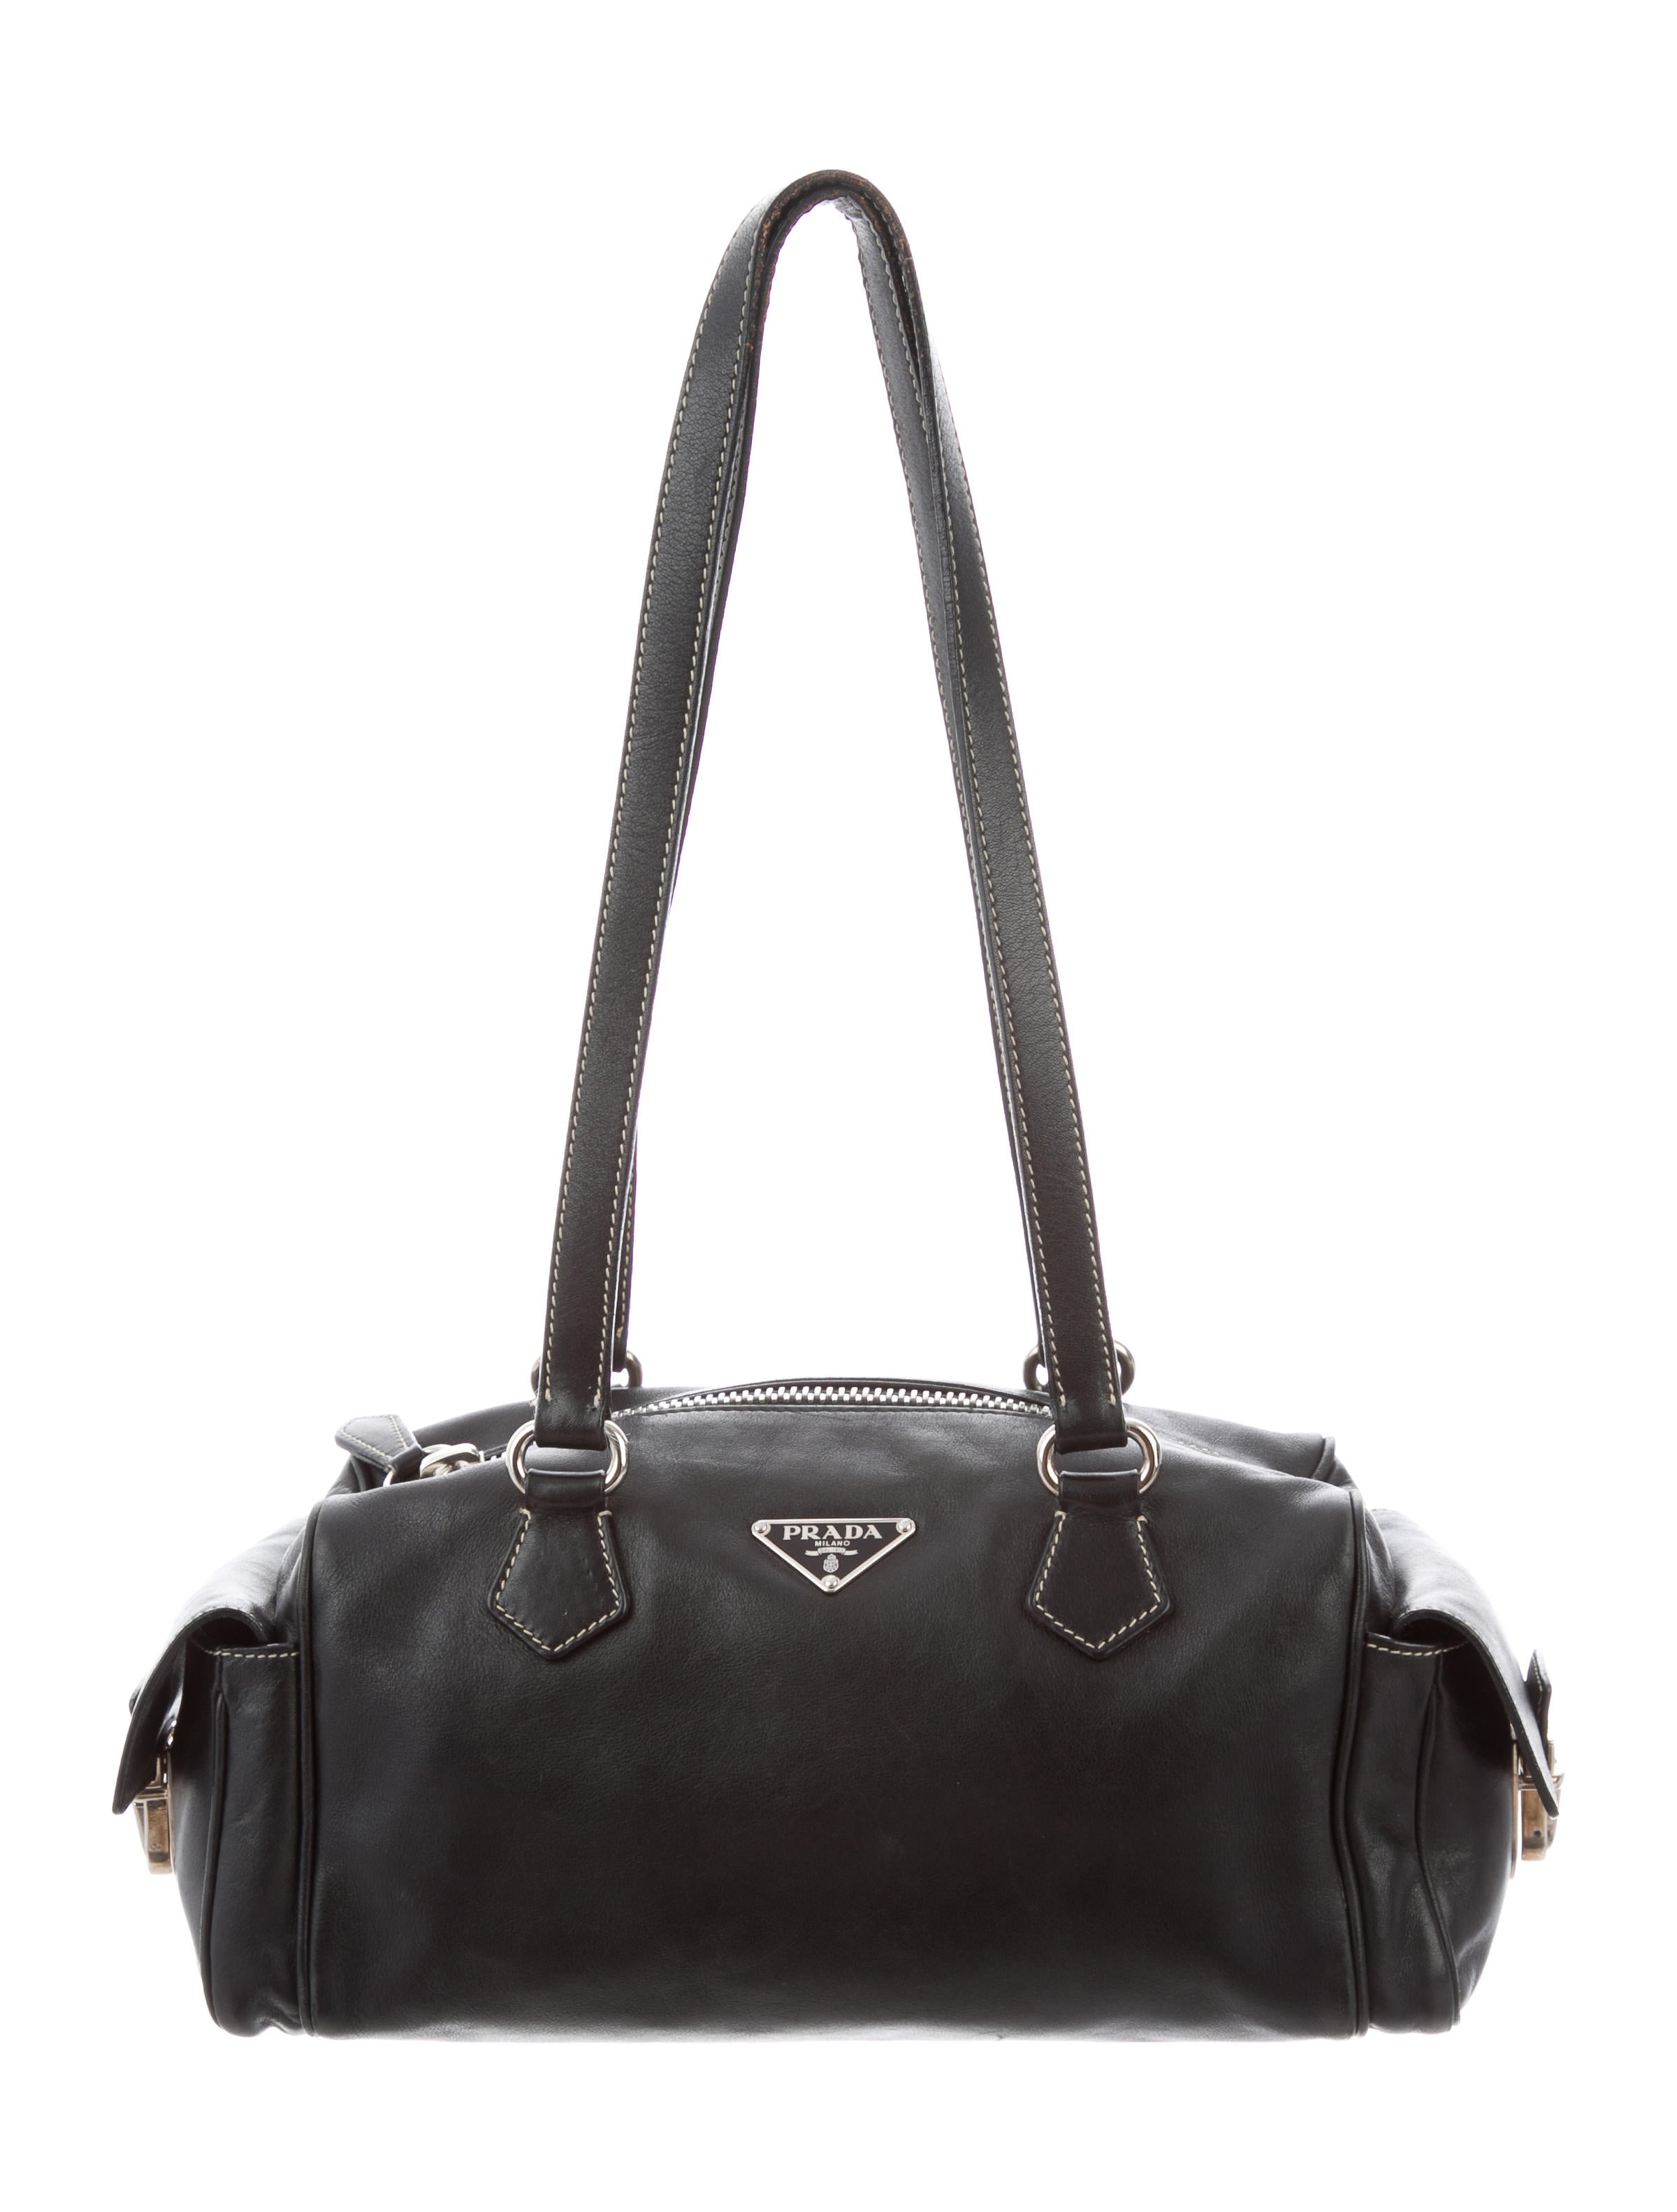 8b32d5ed355663 Leather Bag Prada Shoulder Leather Bag Prada Shoulder 8EzqpR-straits ...